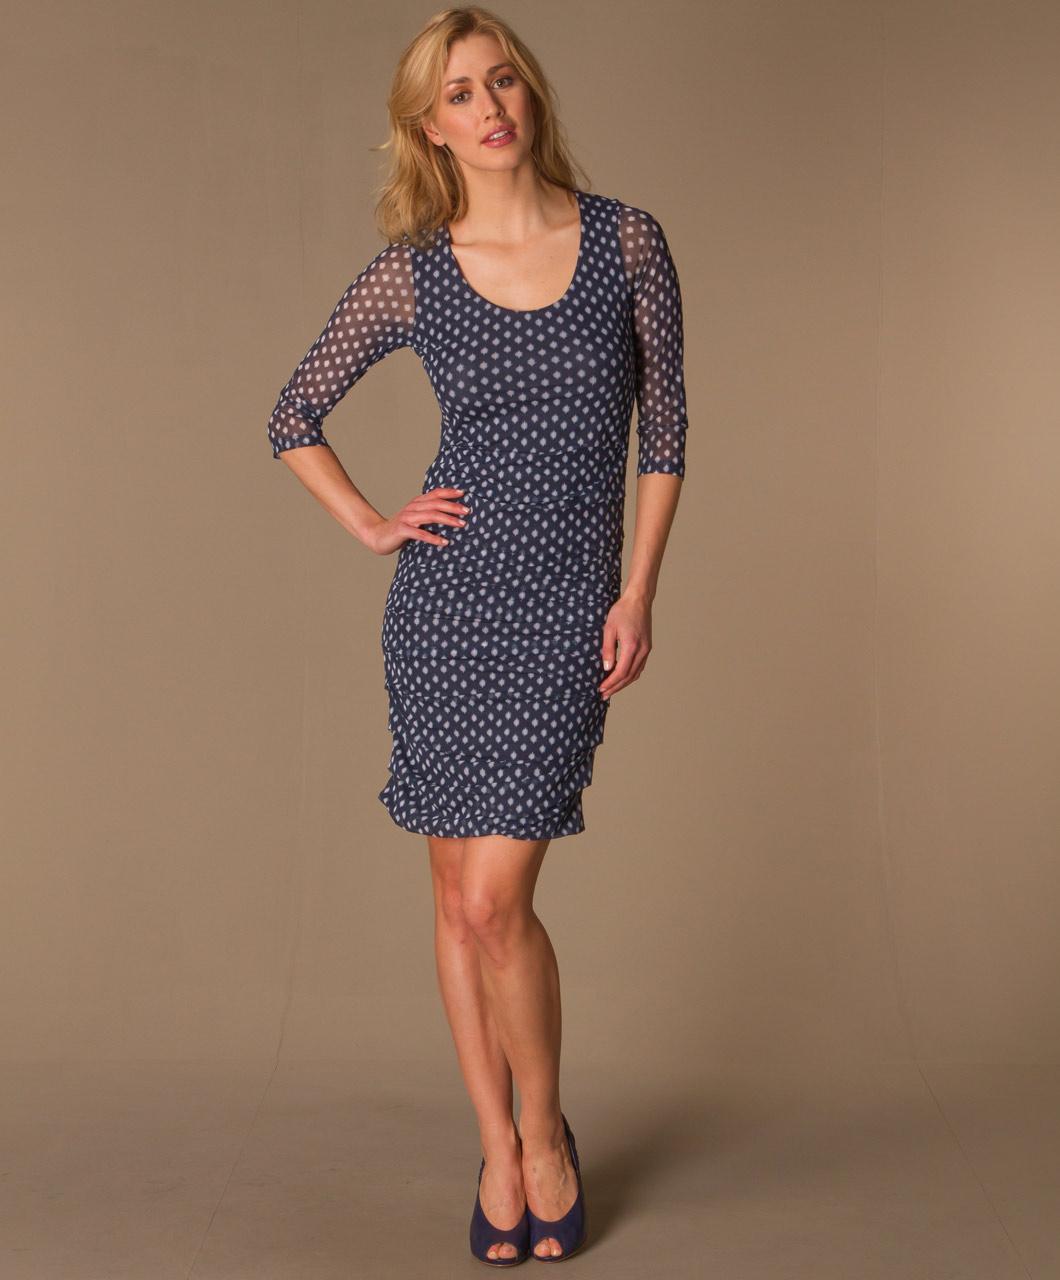 Welke kleur schoenen onder donkerblauwe jurk